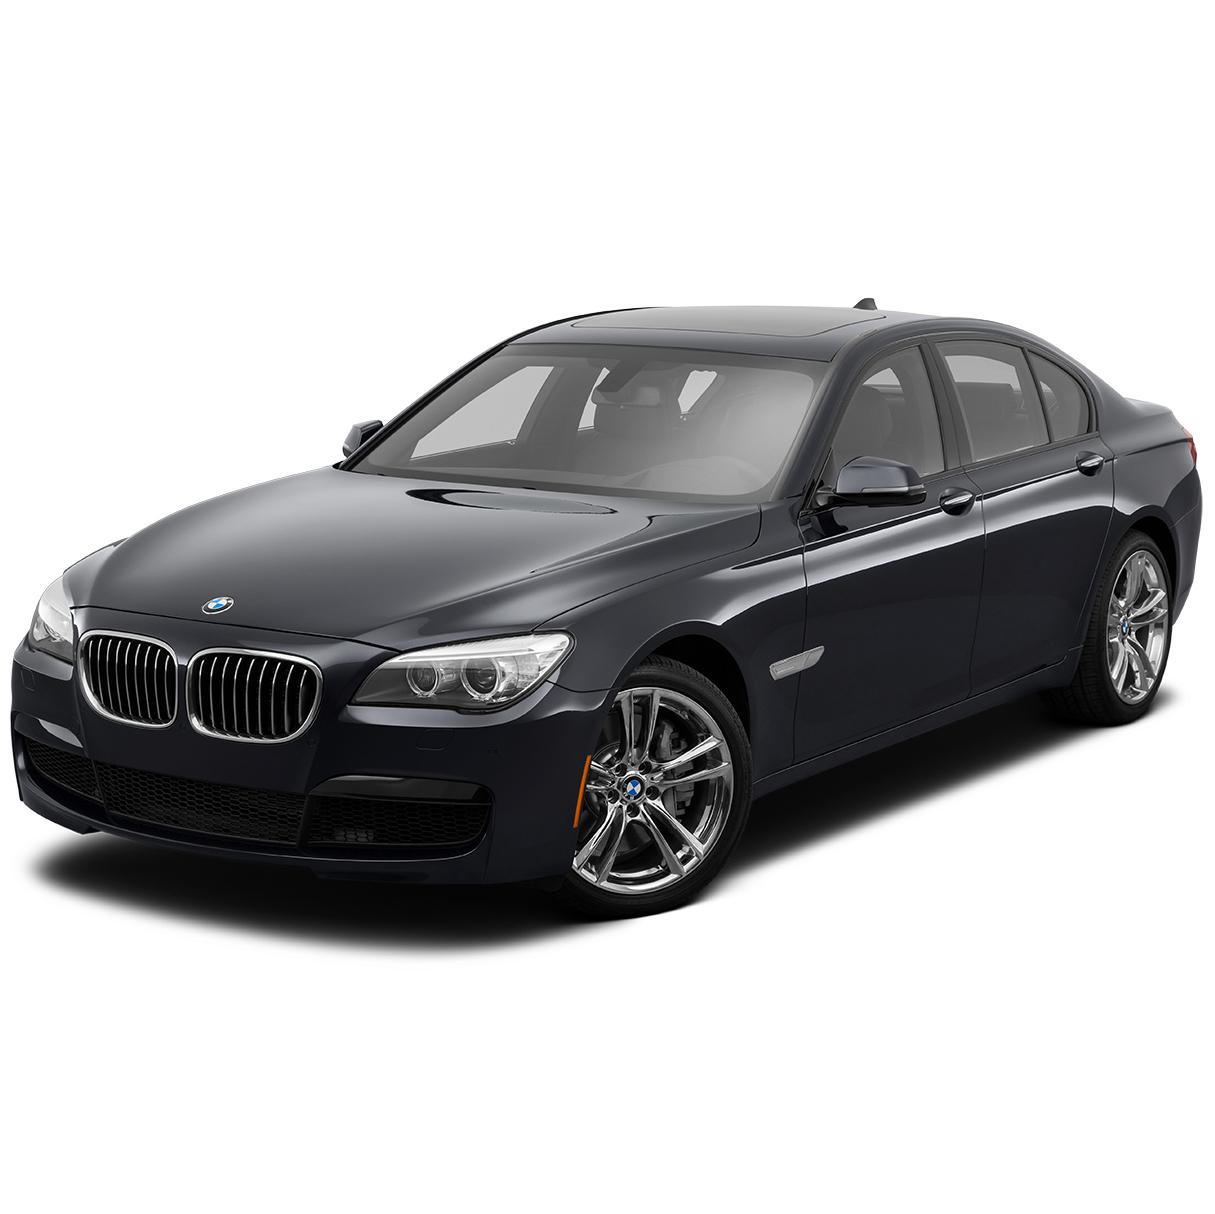 BMW 7 Series (F01) 2009-2016